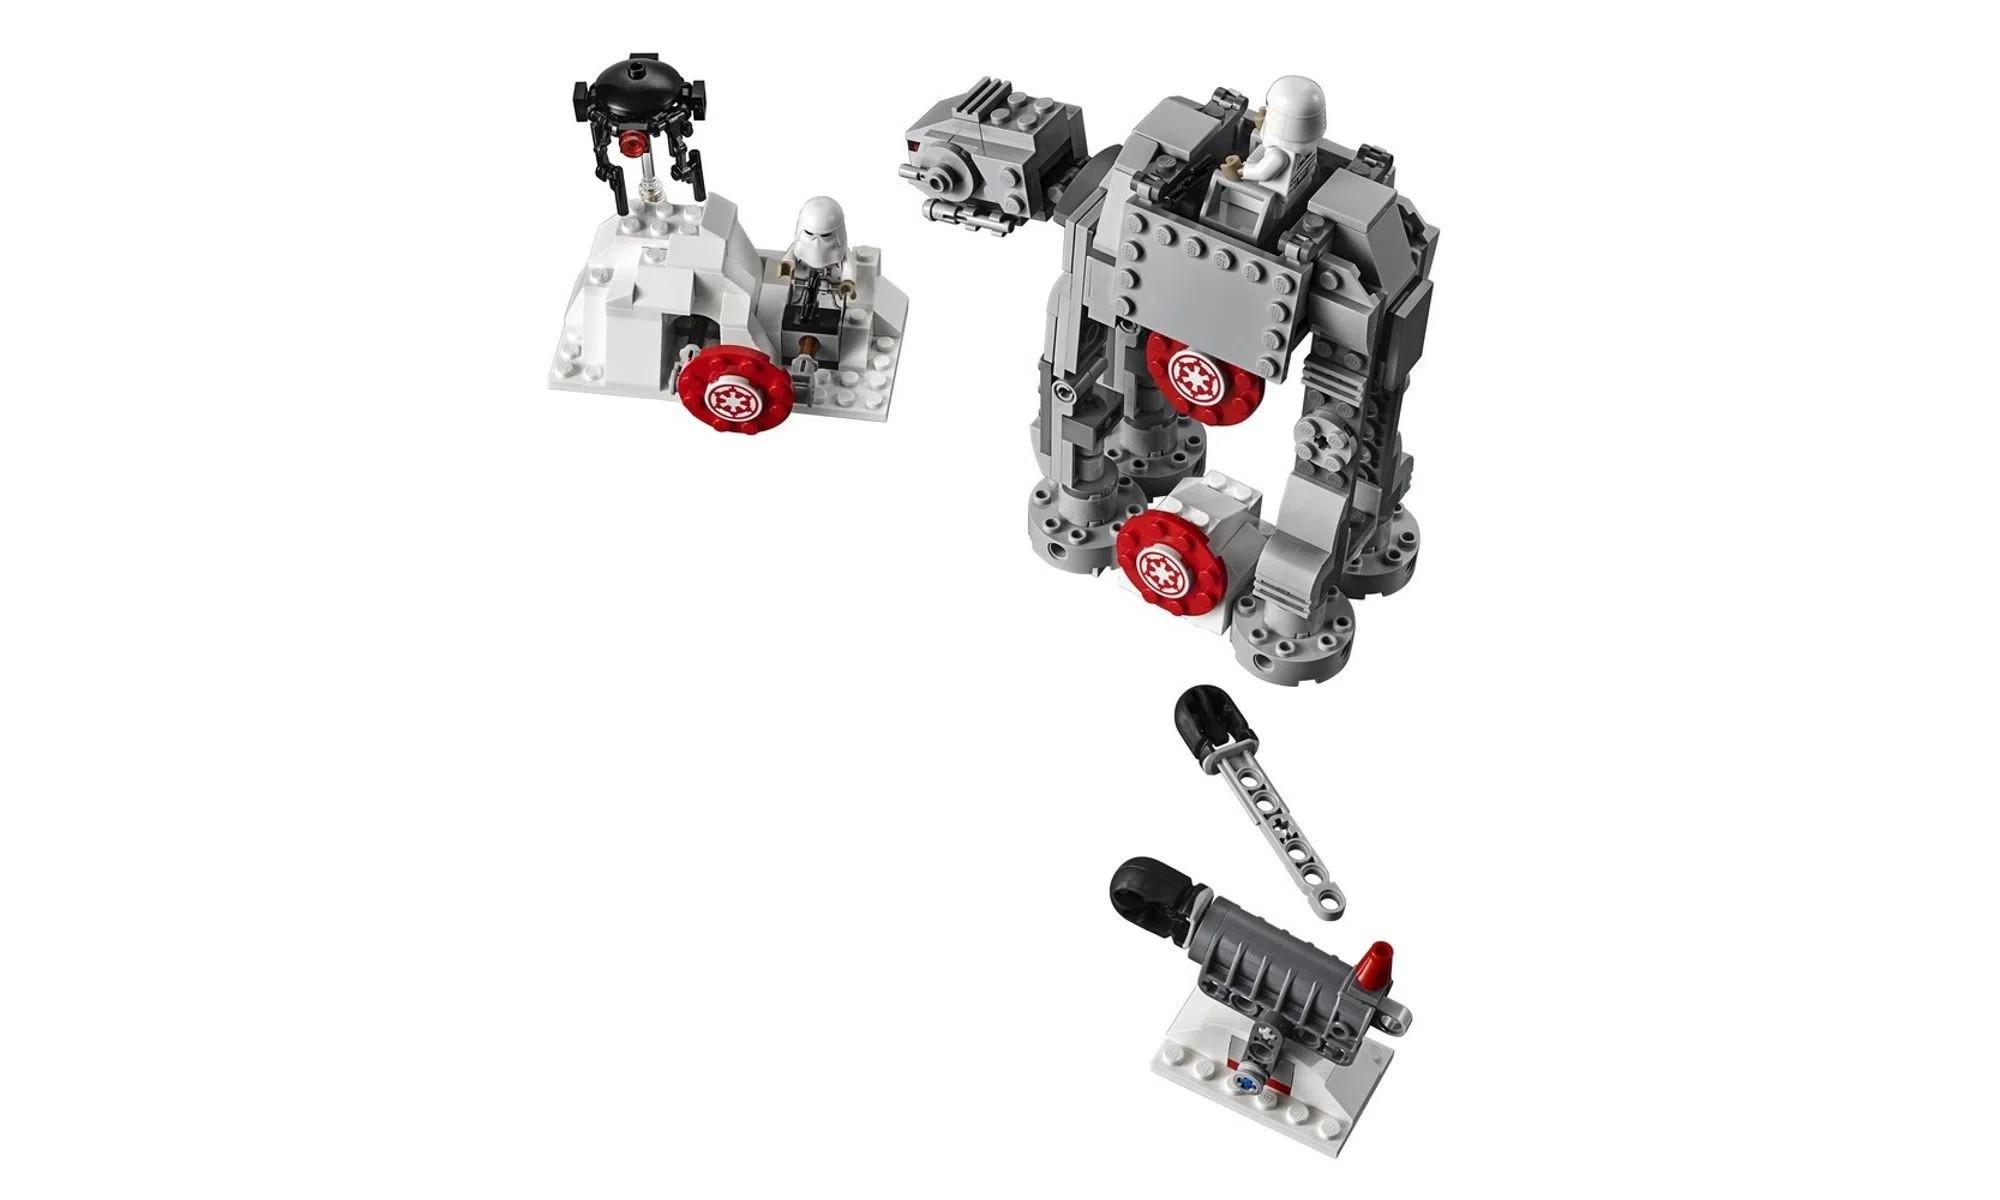 LEGO Star Wars Batalha de Hoth Defesa de base Echo 75241